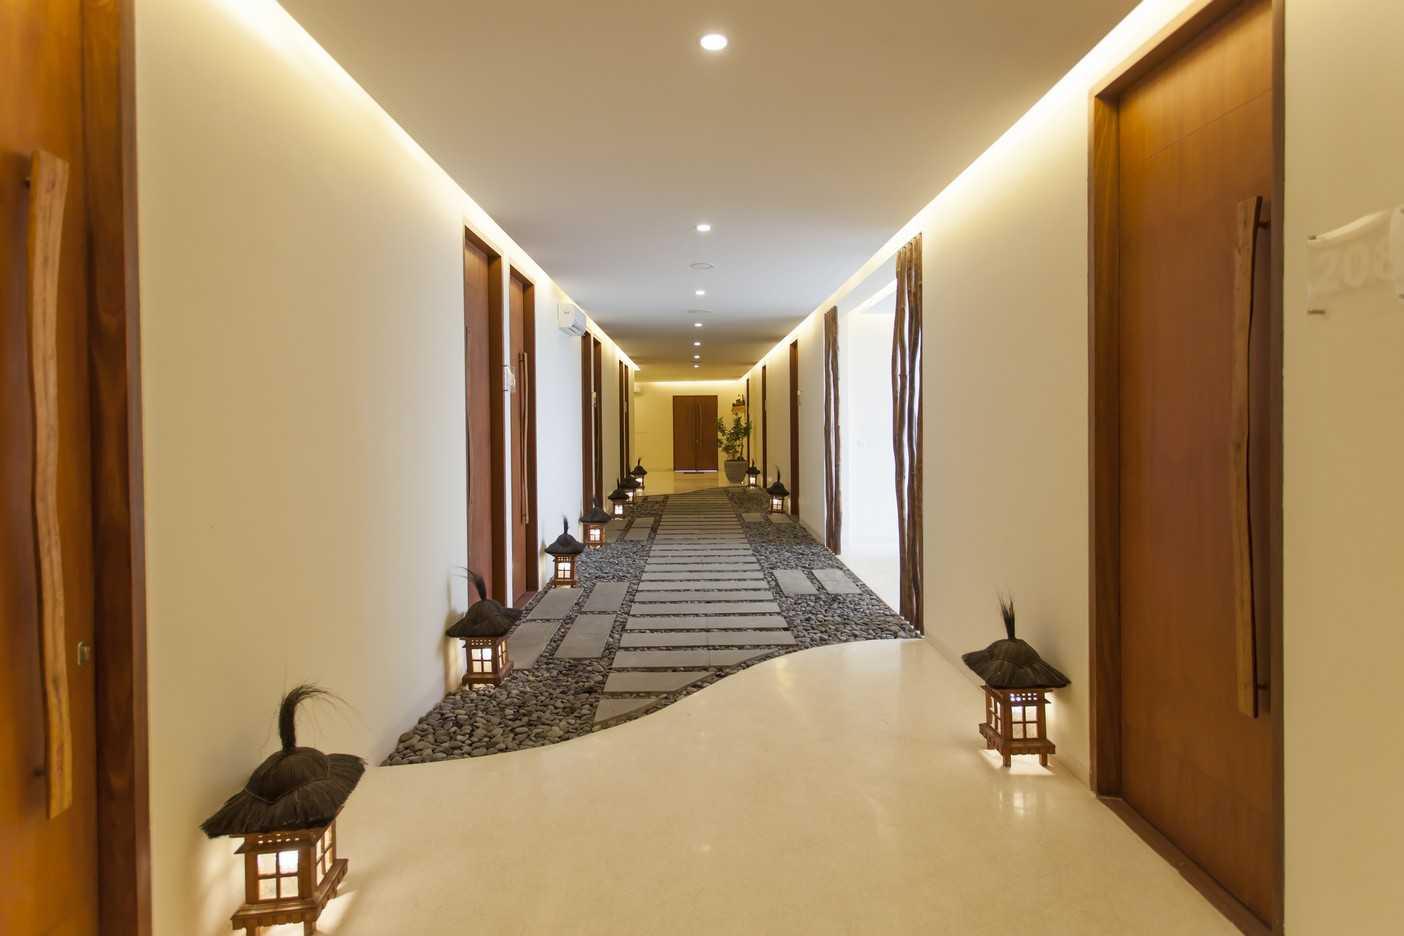 Emporio Architect Zen Family Spa Nusa Dua Benoa, Kec. Kuta Sel., Kabupaten Badung, Bali, Indonesia Benoa, Kec. Kuta Sel., Kabupaten Badung, Bali, Indonesia Emporio-Architect-Zen-Family-Spa-Nusa-Dua  72699